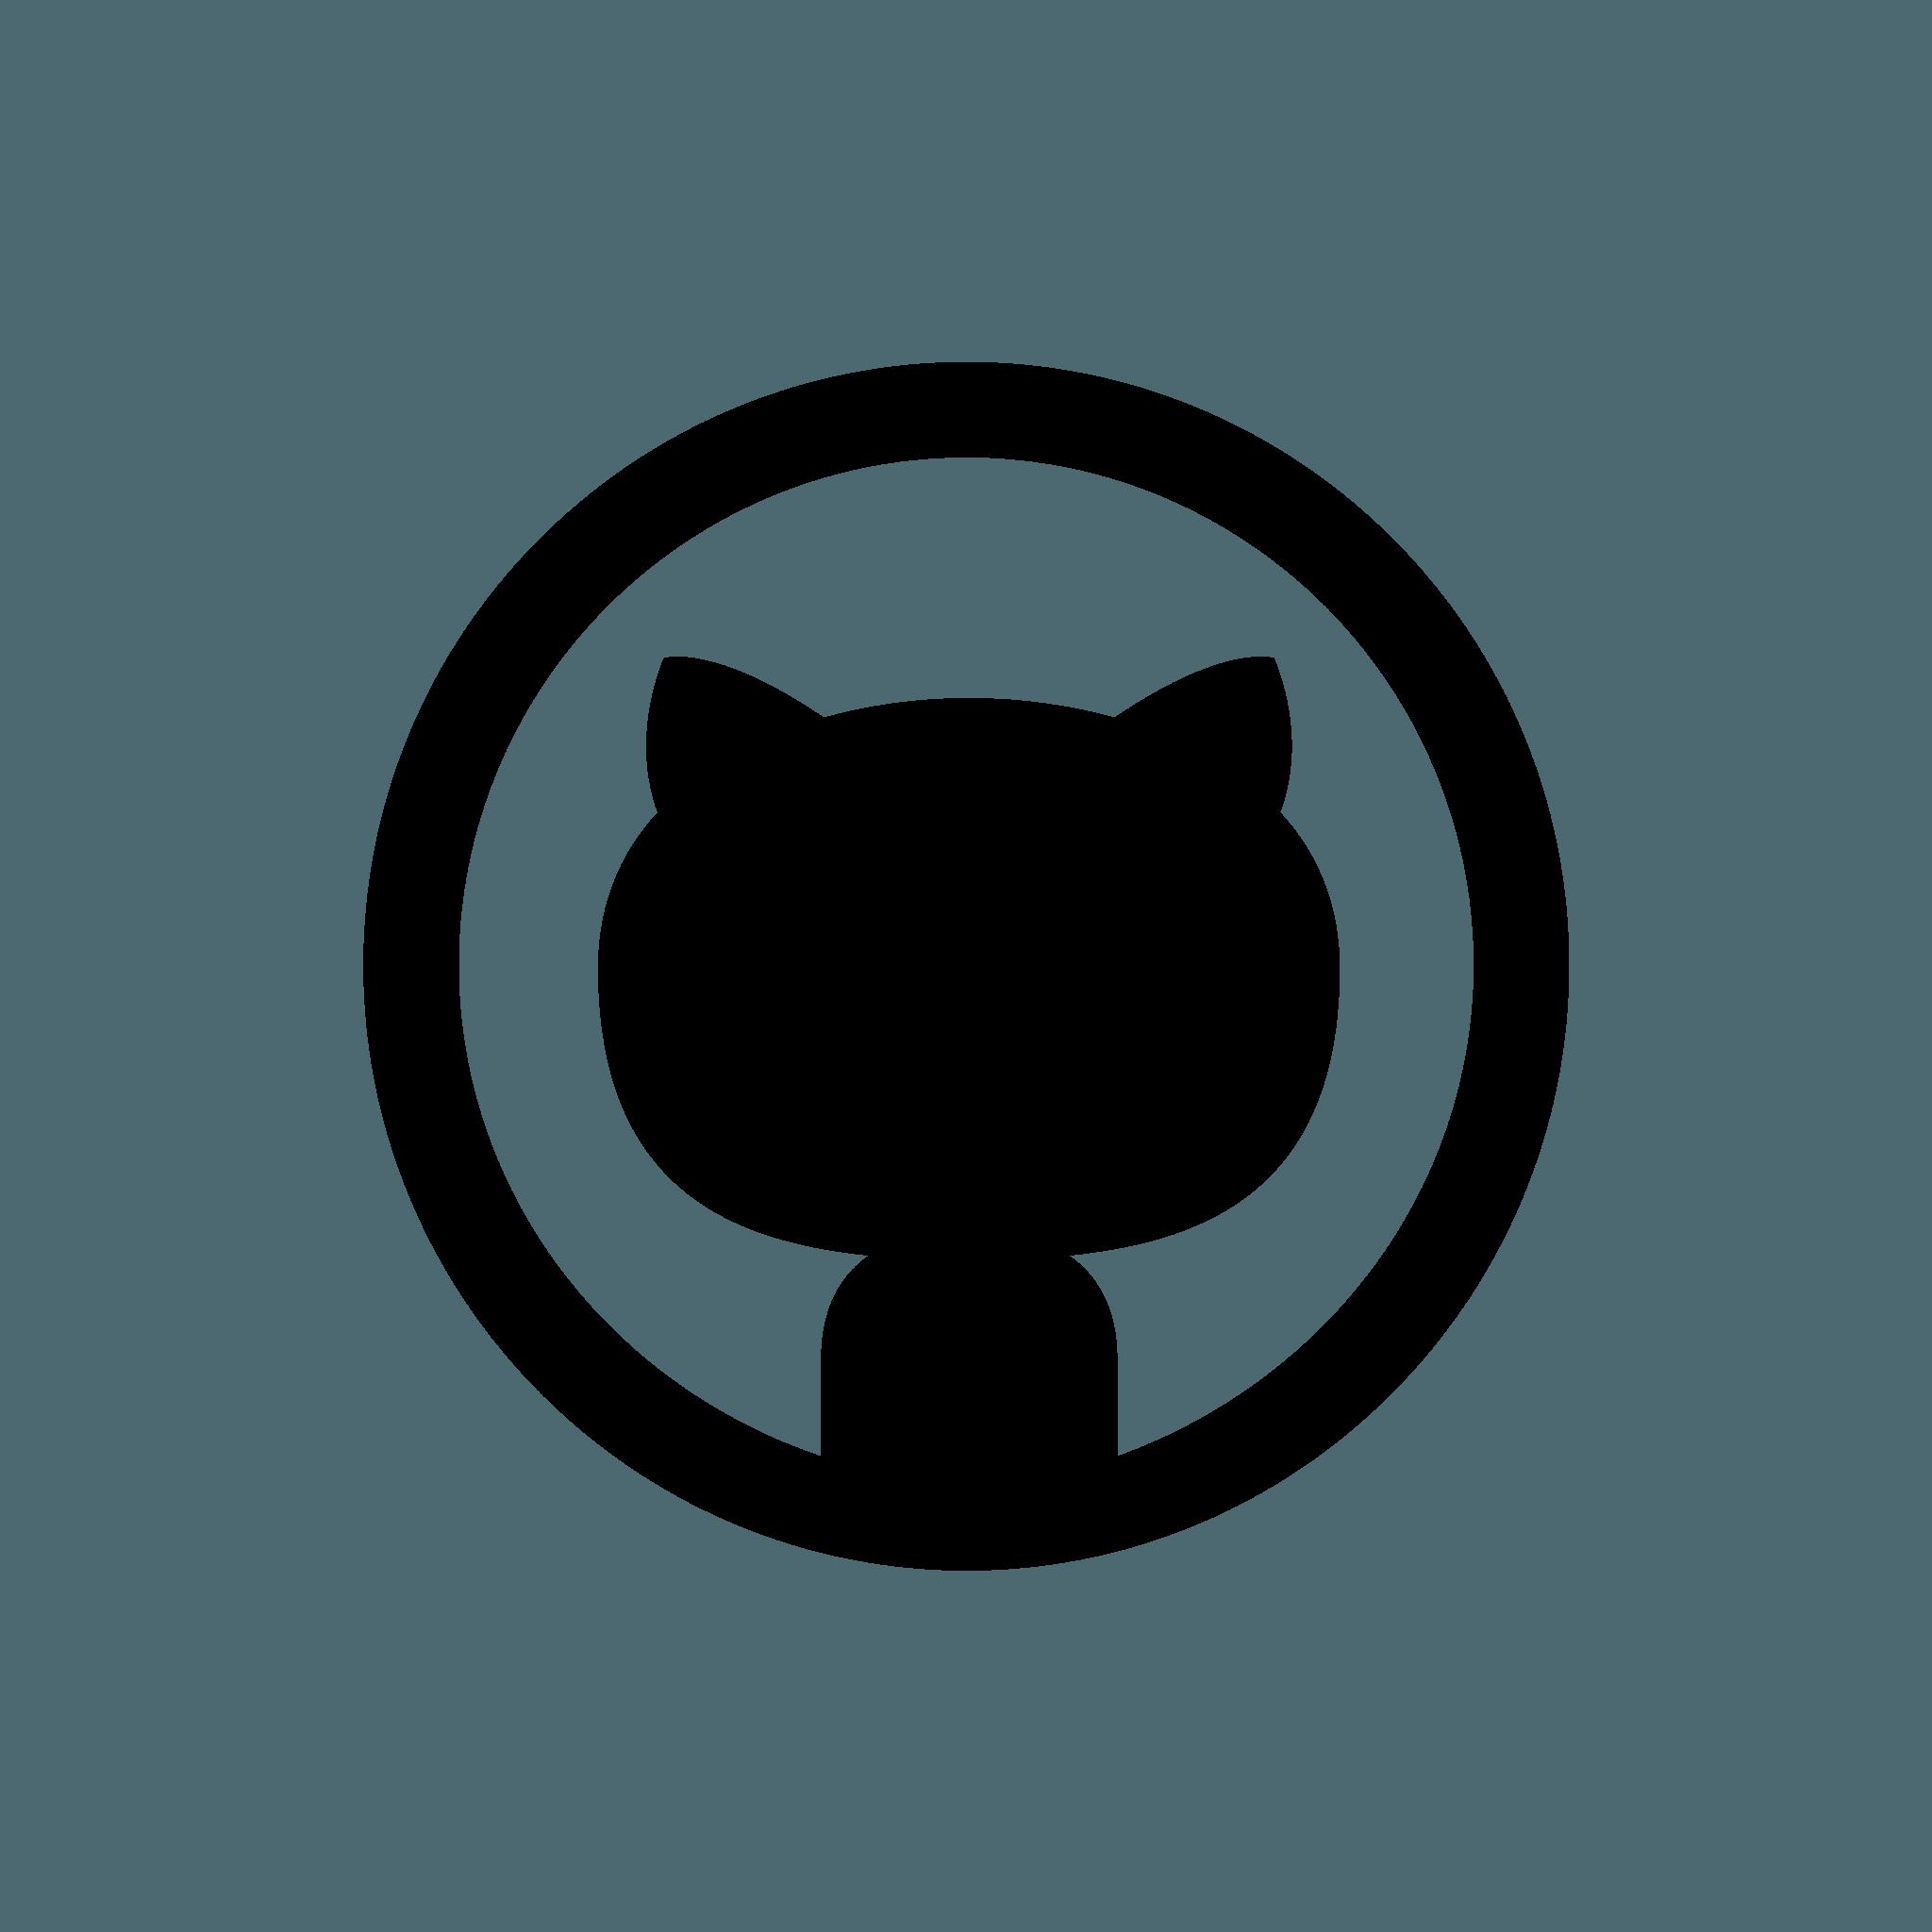 Official Github Logo - LogoDix